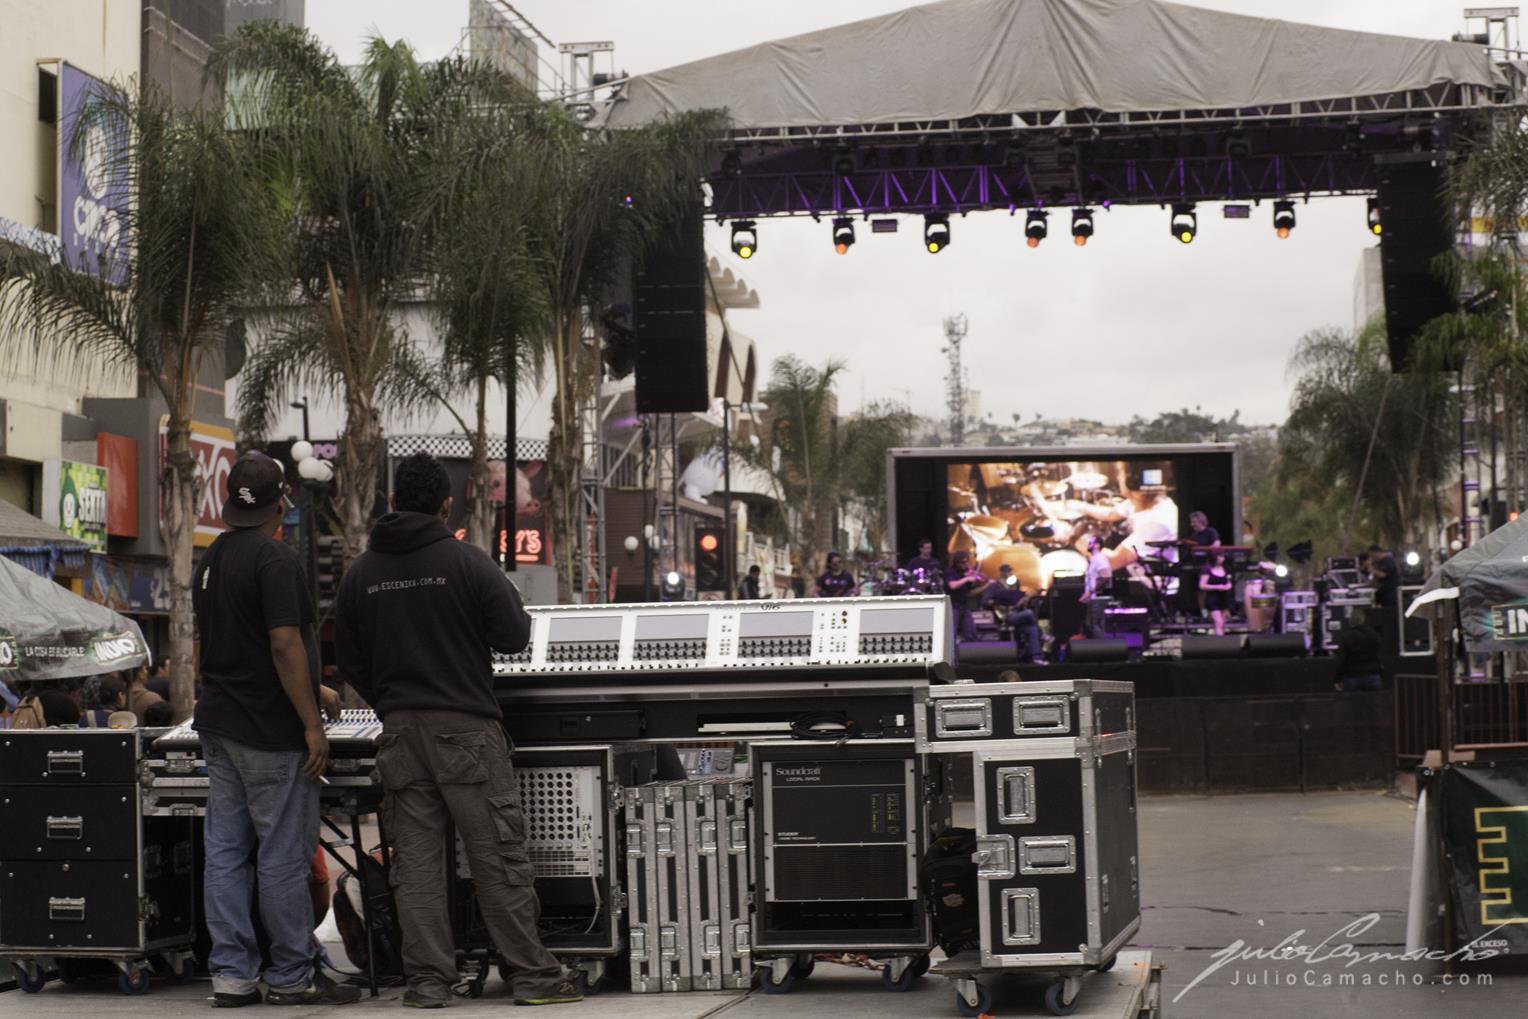 2014-10-30 31 CAST TOUR Ensenada y Tijuana - 1266 - www.Juli (Copy).jpg